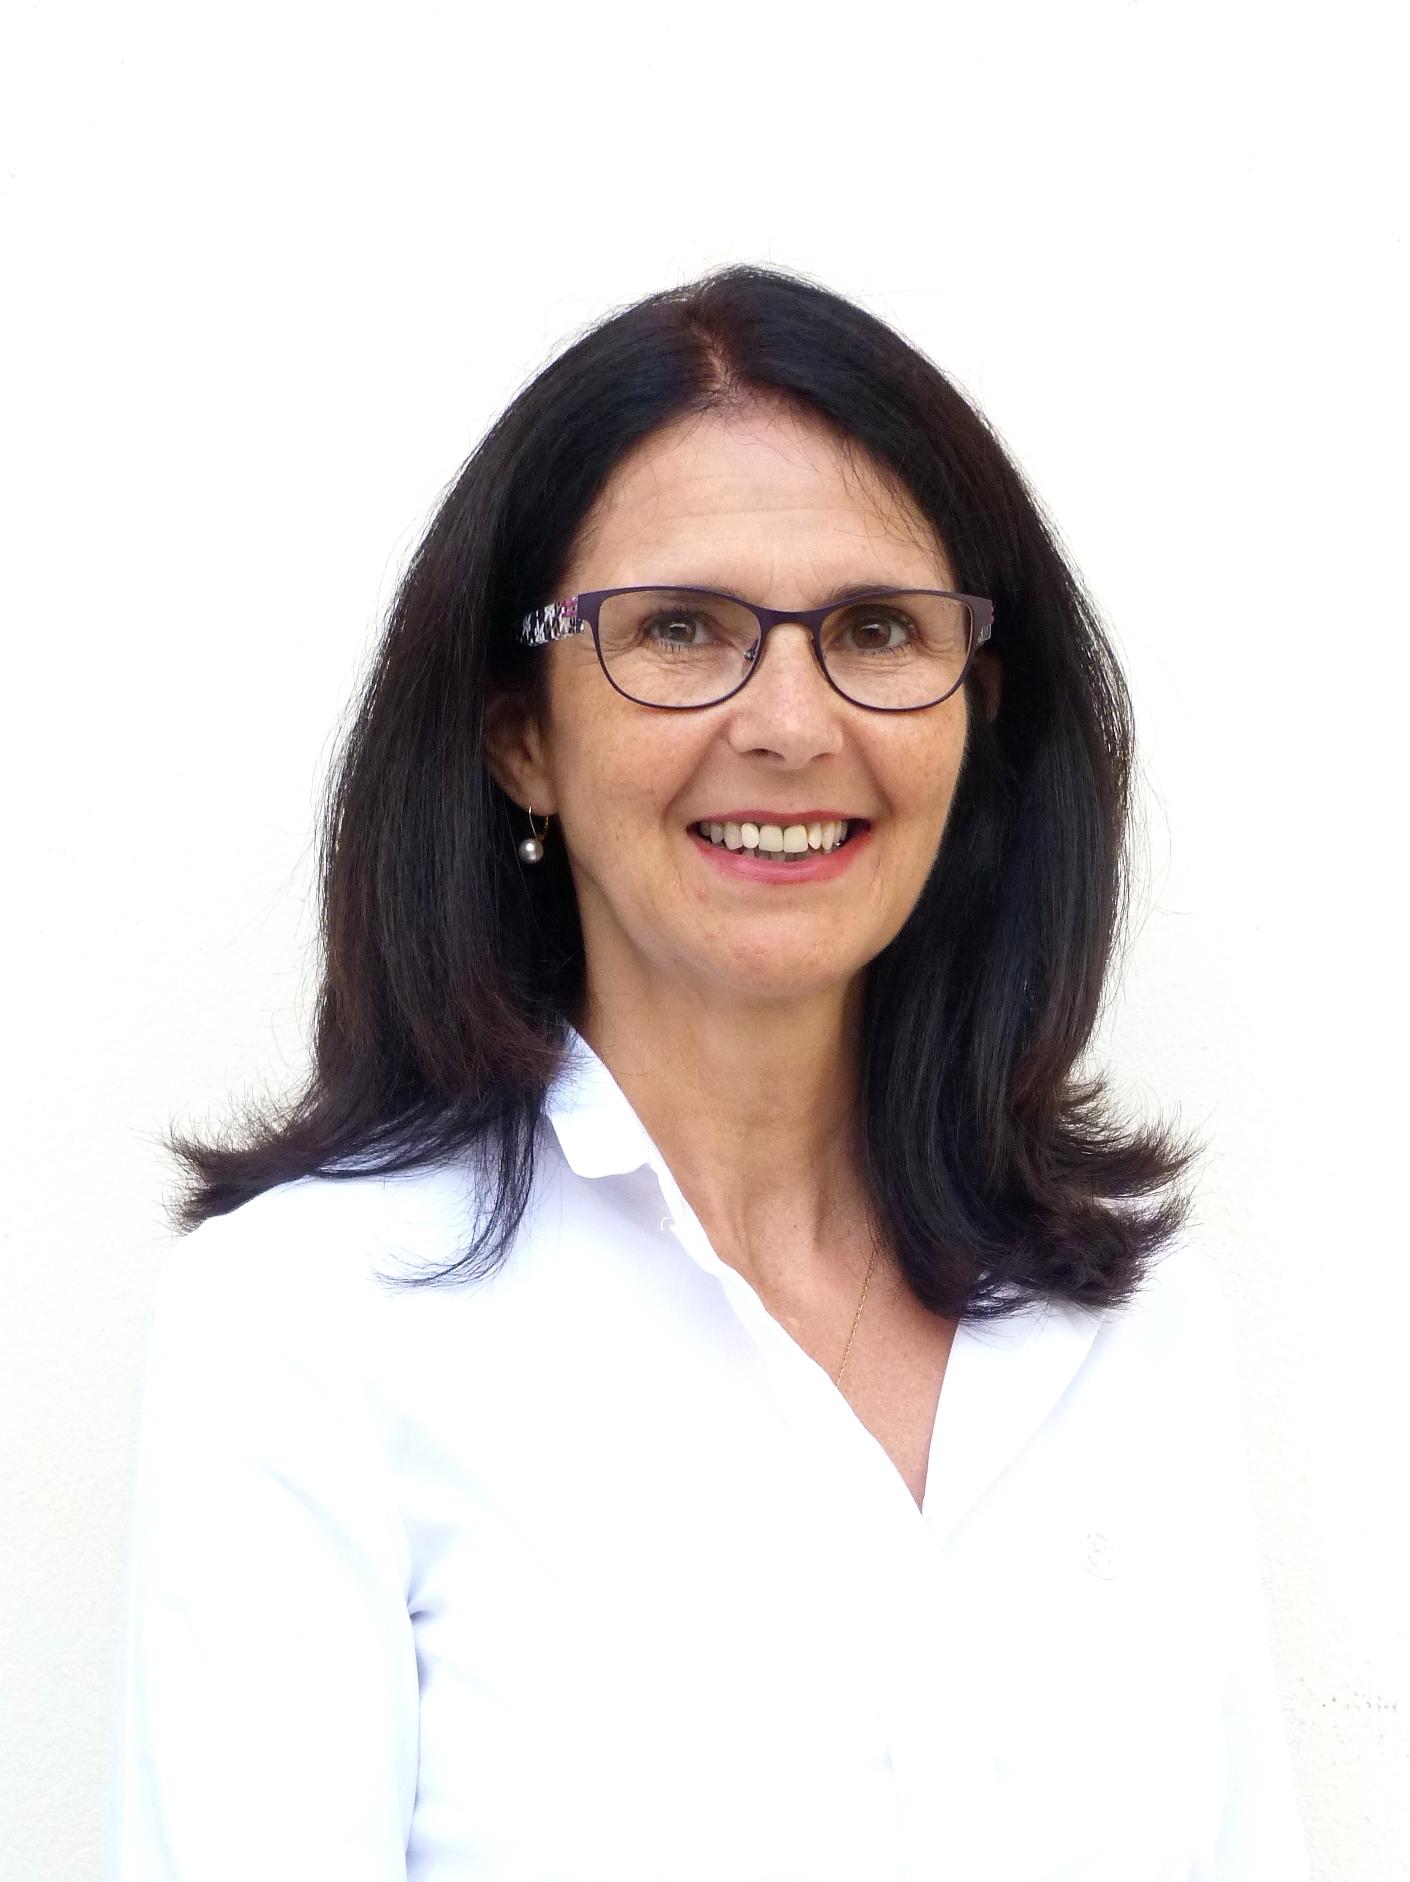 Marie-Line Segla